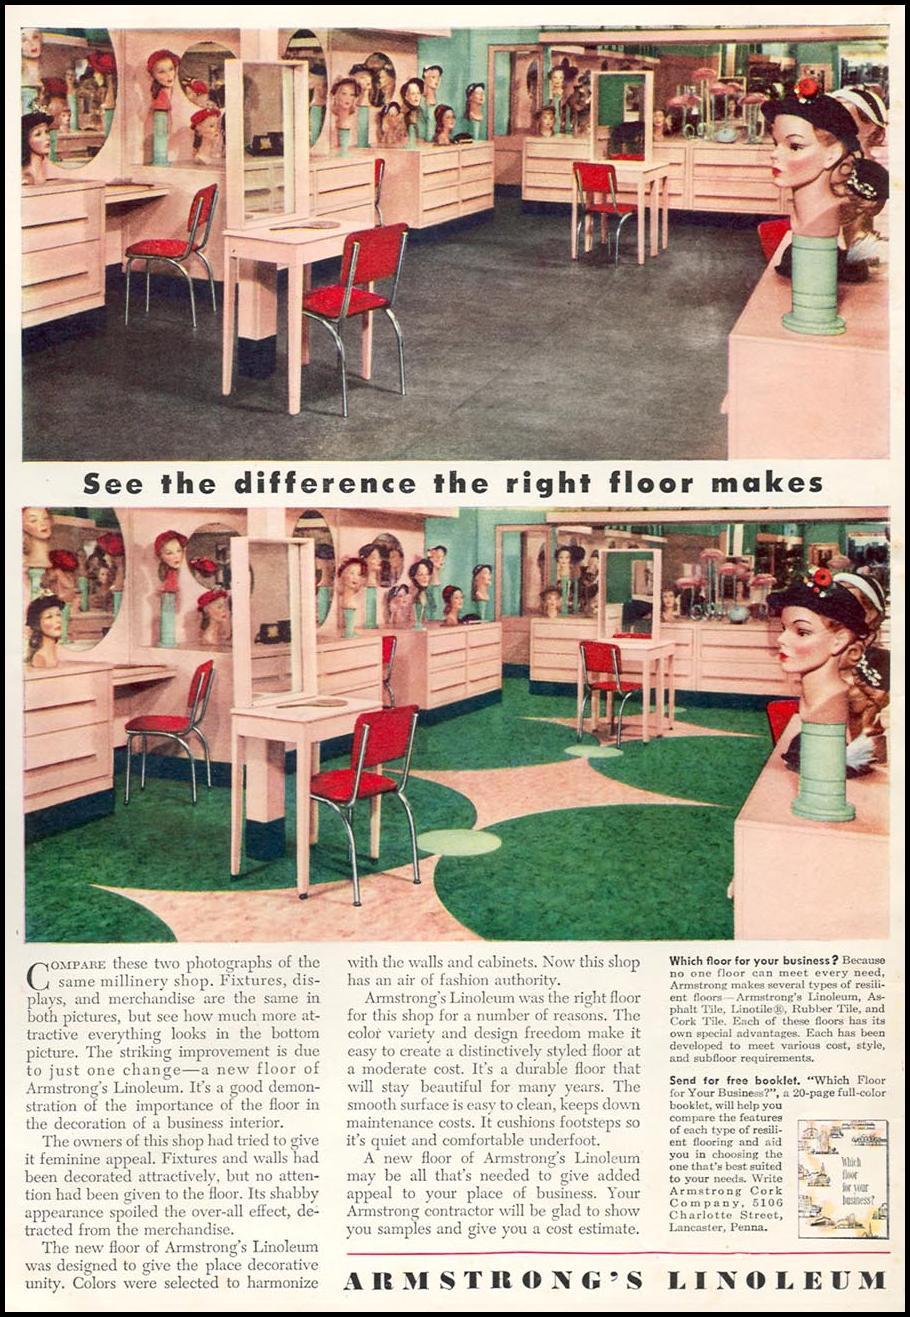 ARMSTRONG LINOLEUM FLOORS NEWSWEEK 06/11/1951 INSIDE FRONT